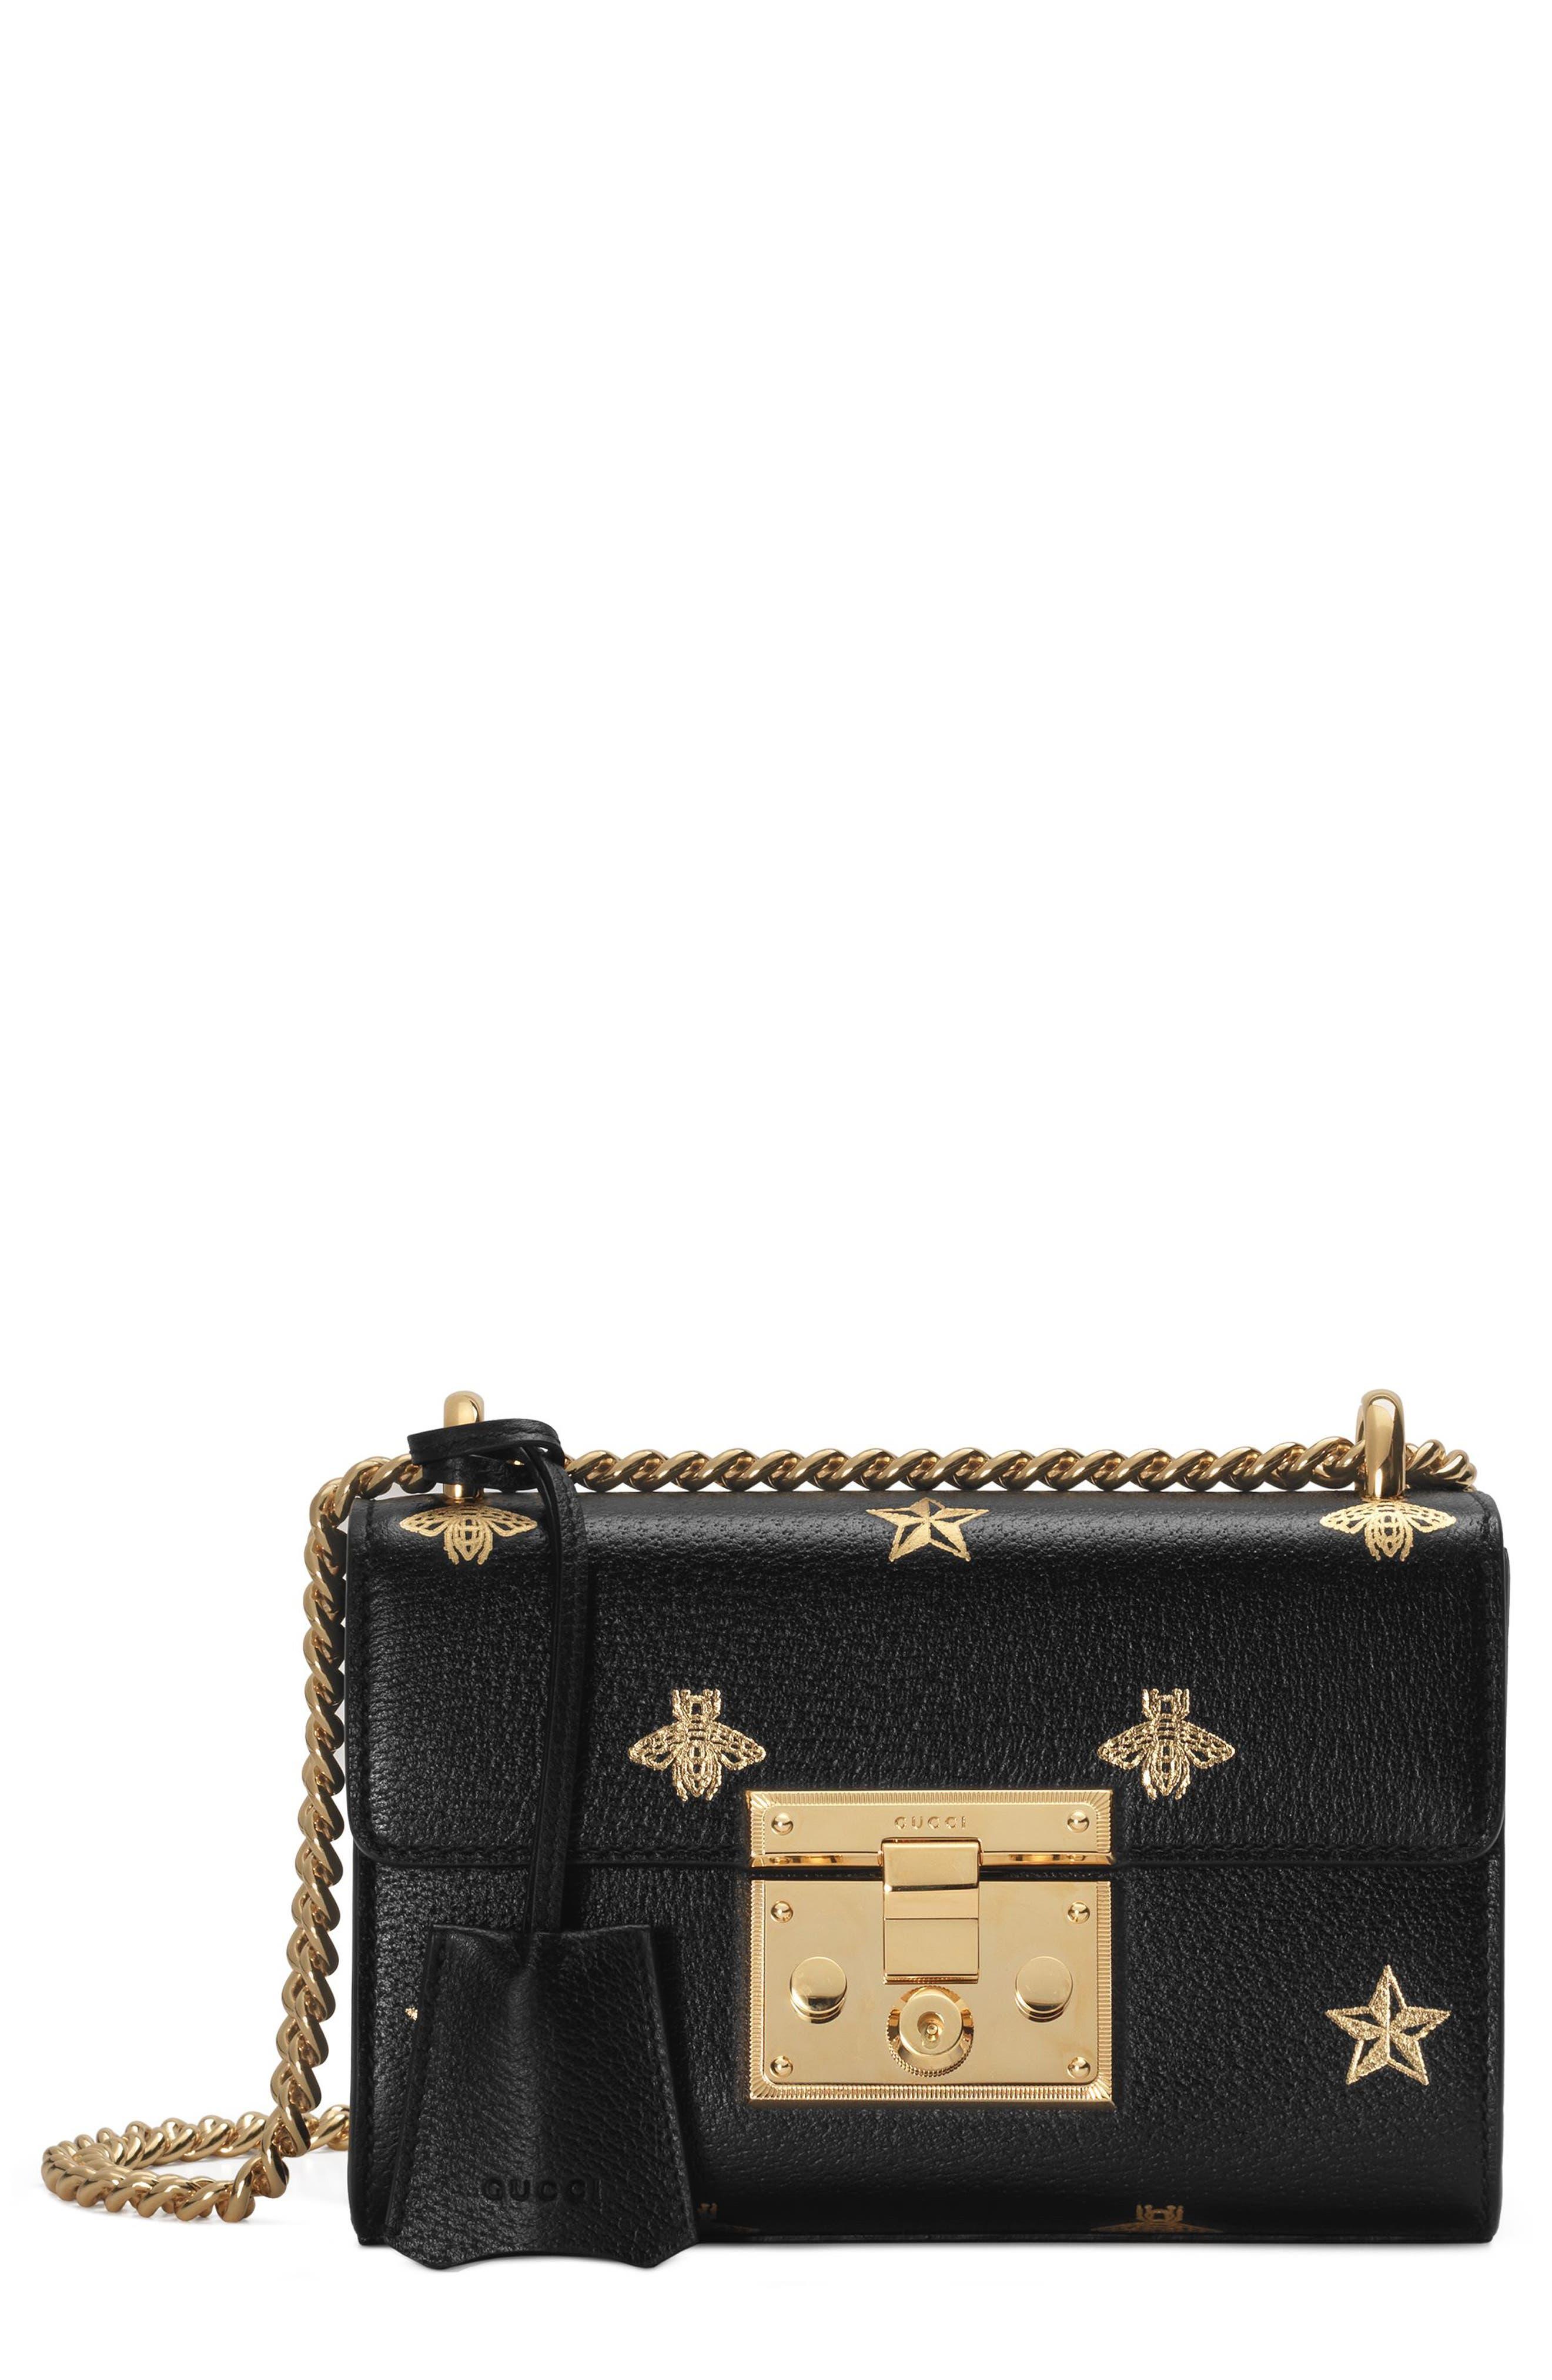 GUCCI, Mini Padlock Leather Shoulder Bag, Main thumbnail 1, color, NERO/ ORO